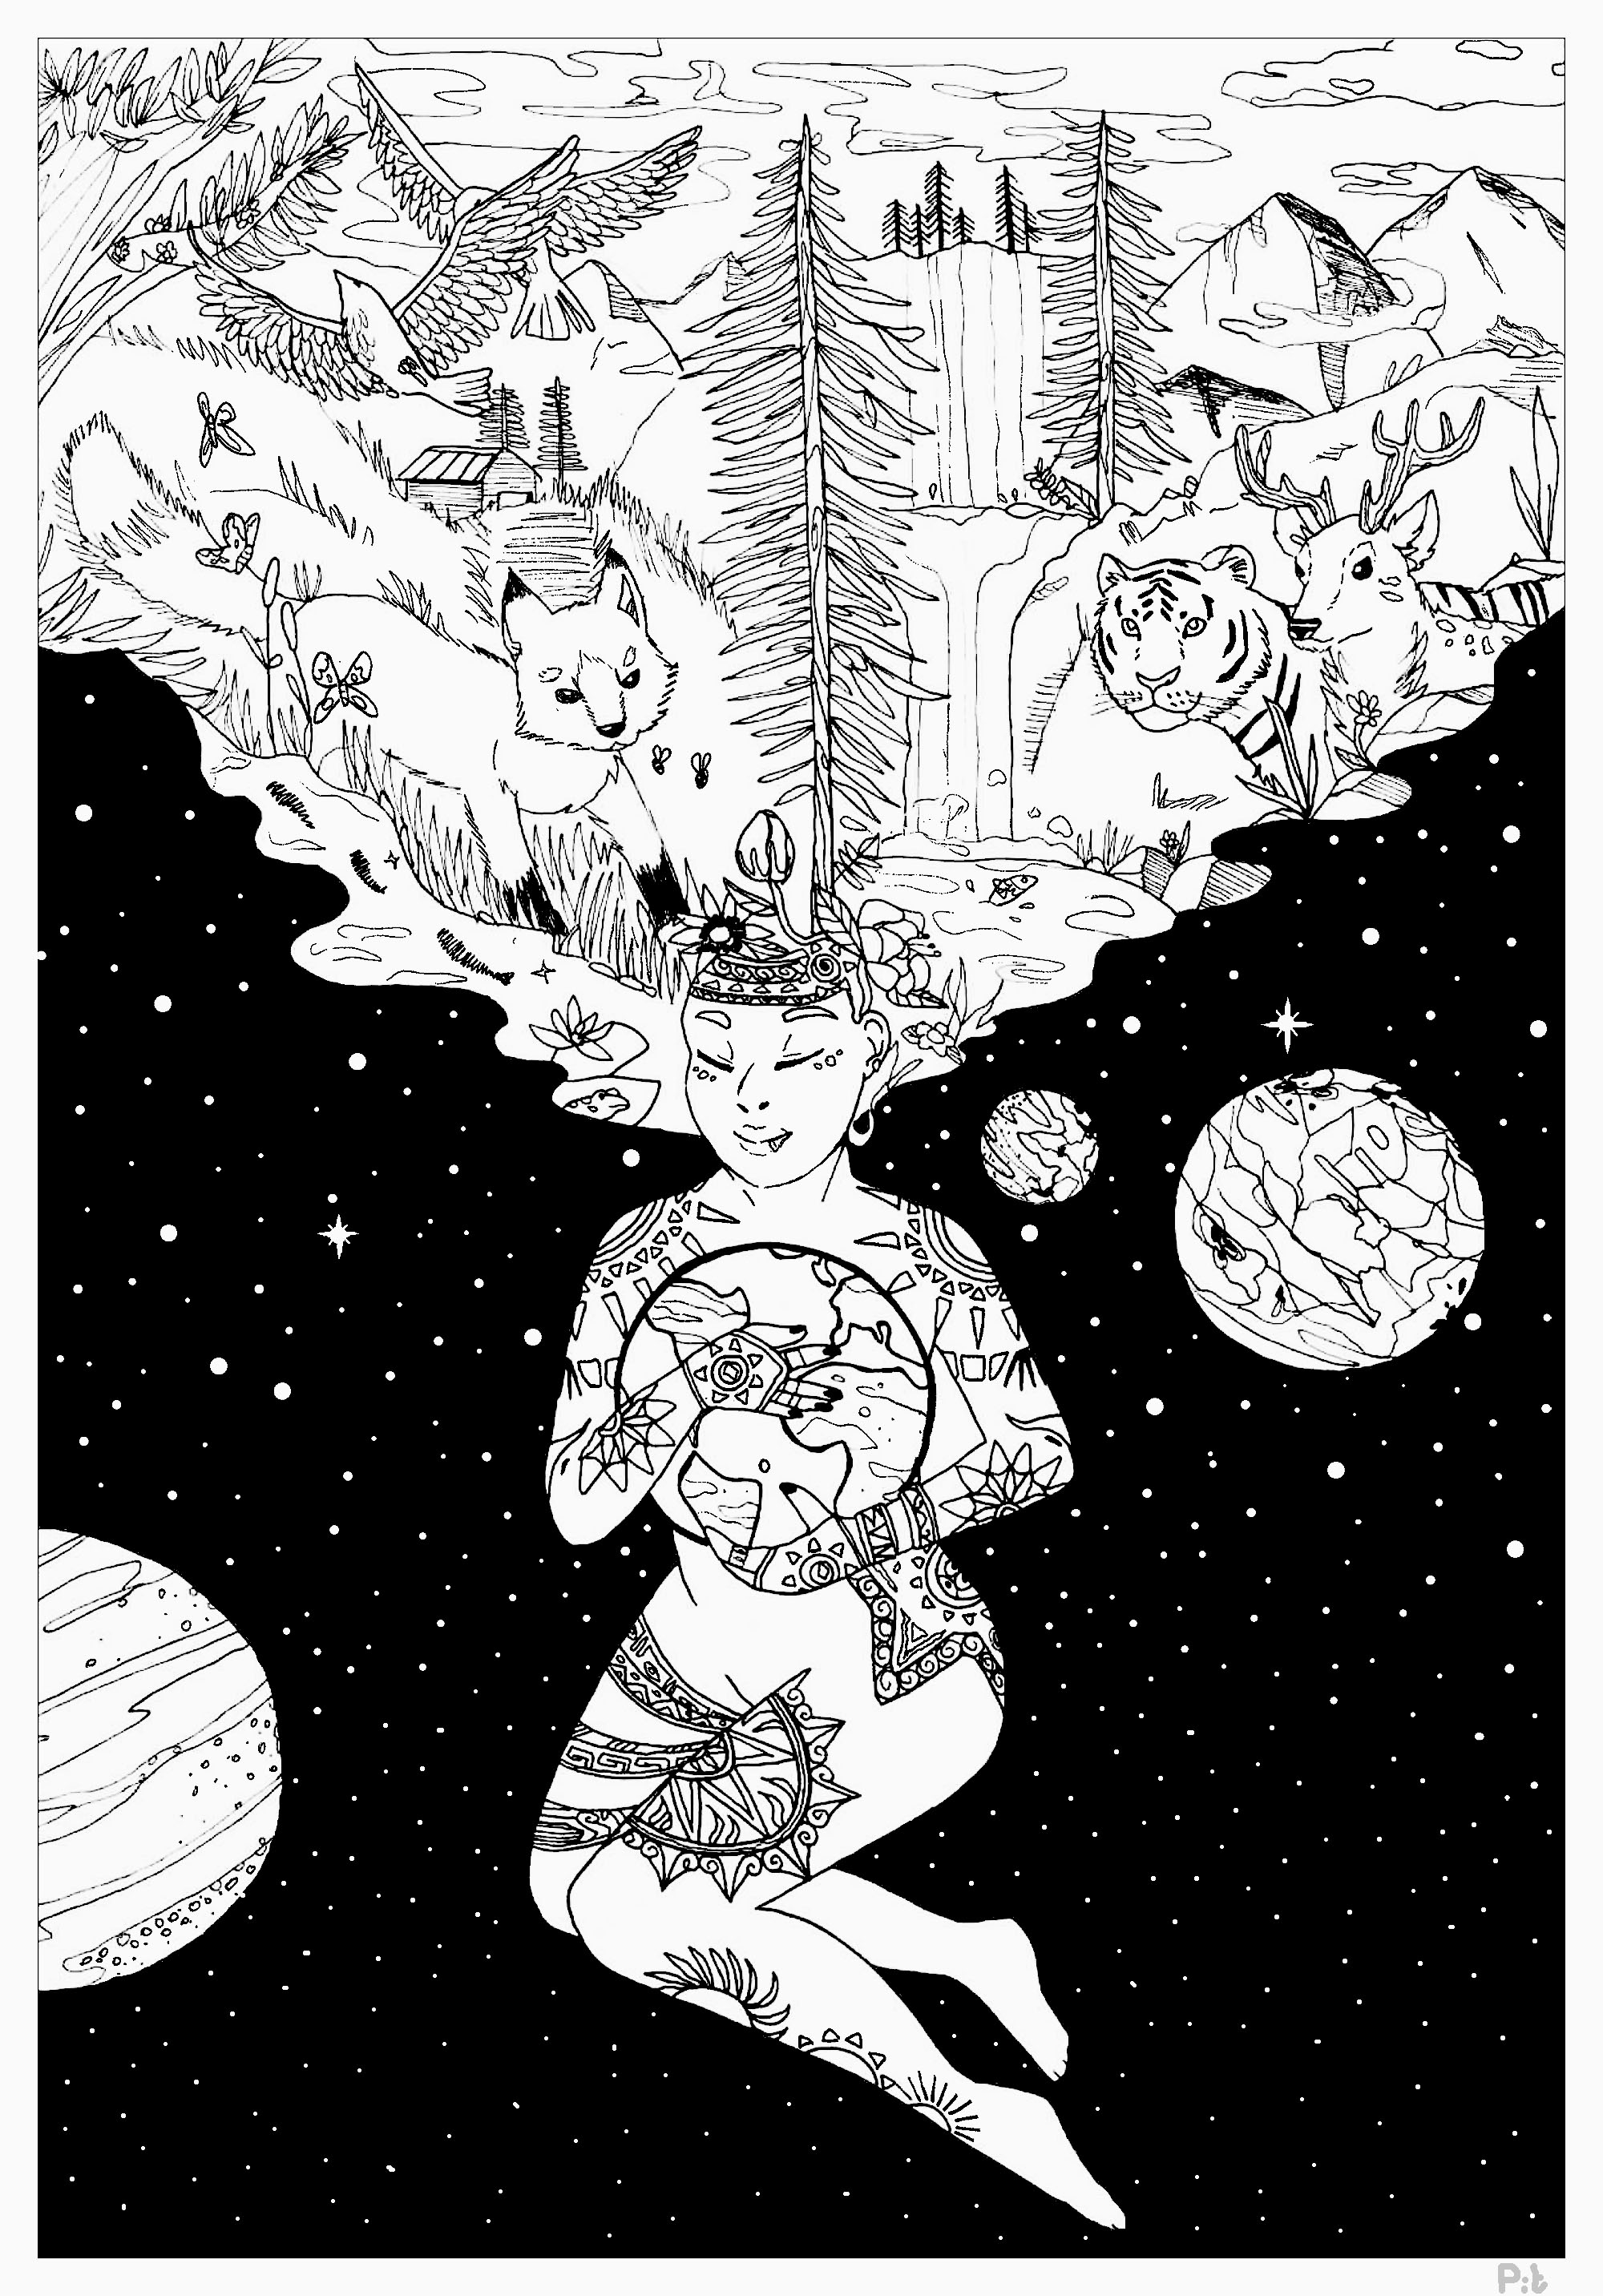 16168 - Tag Der Erde - Malbuch Fur Erwachsene